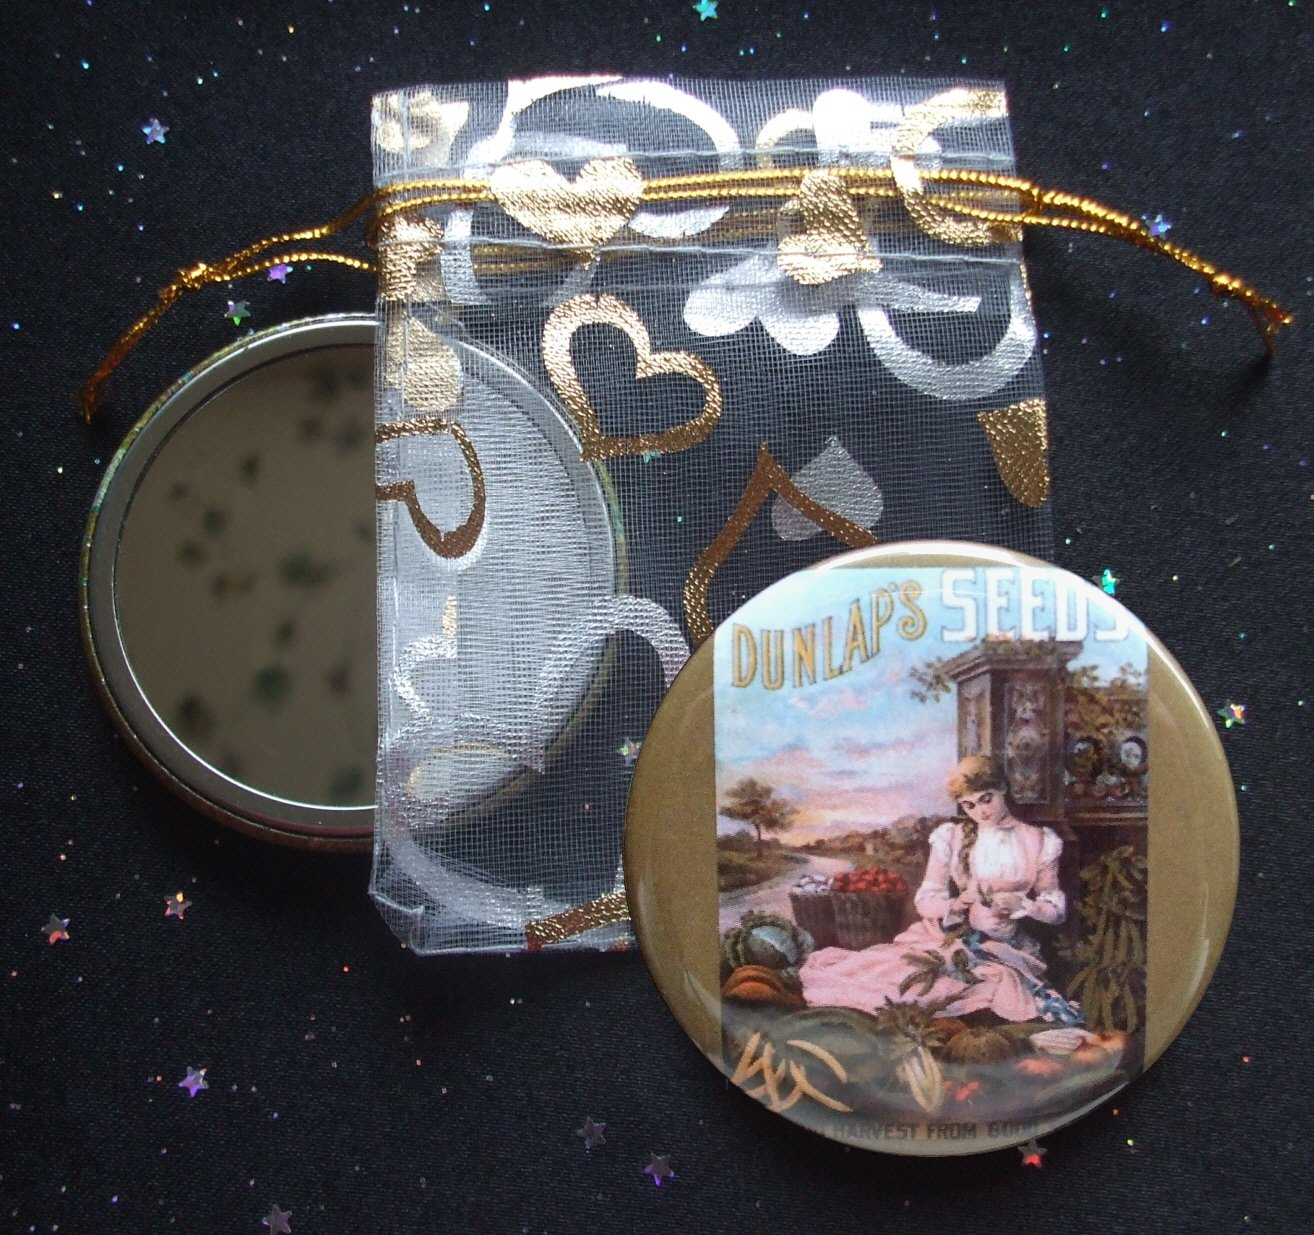 Dunlap's Vintage Seed Catalog Illustration Pocket Mirror